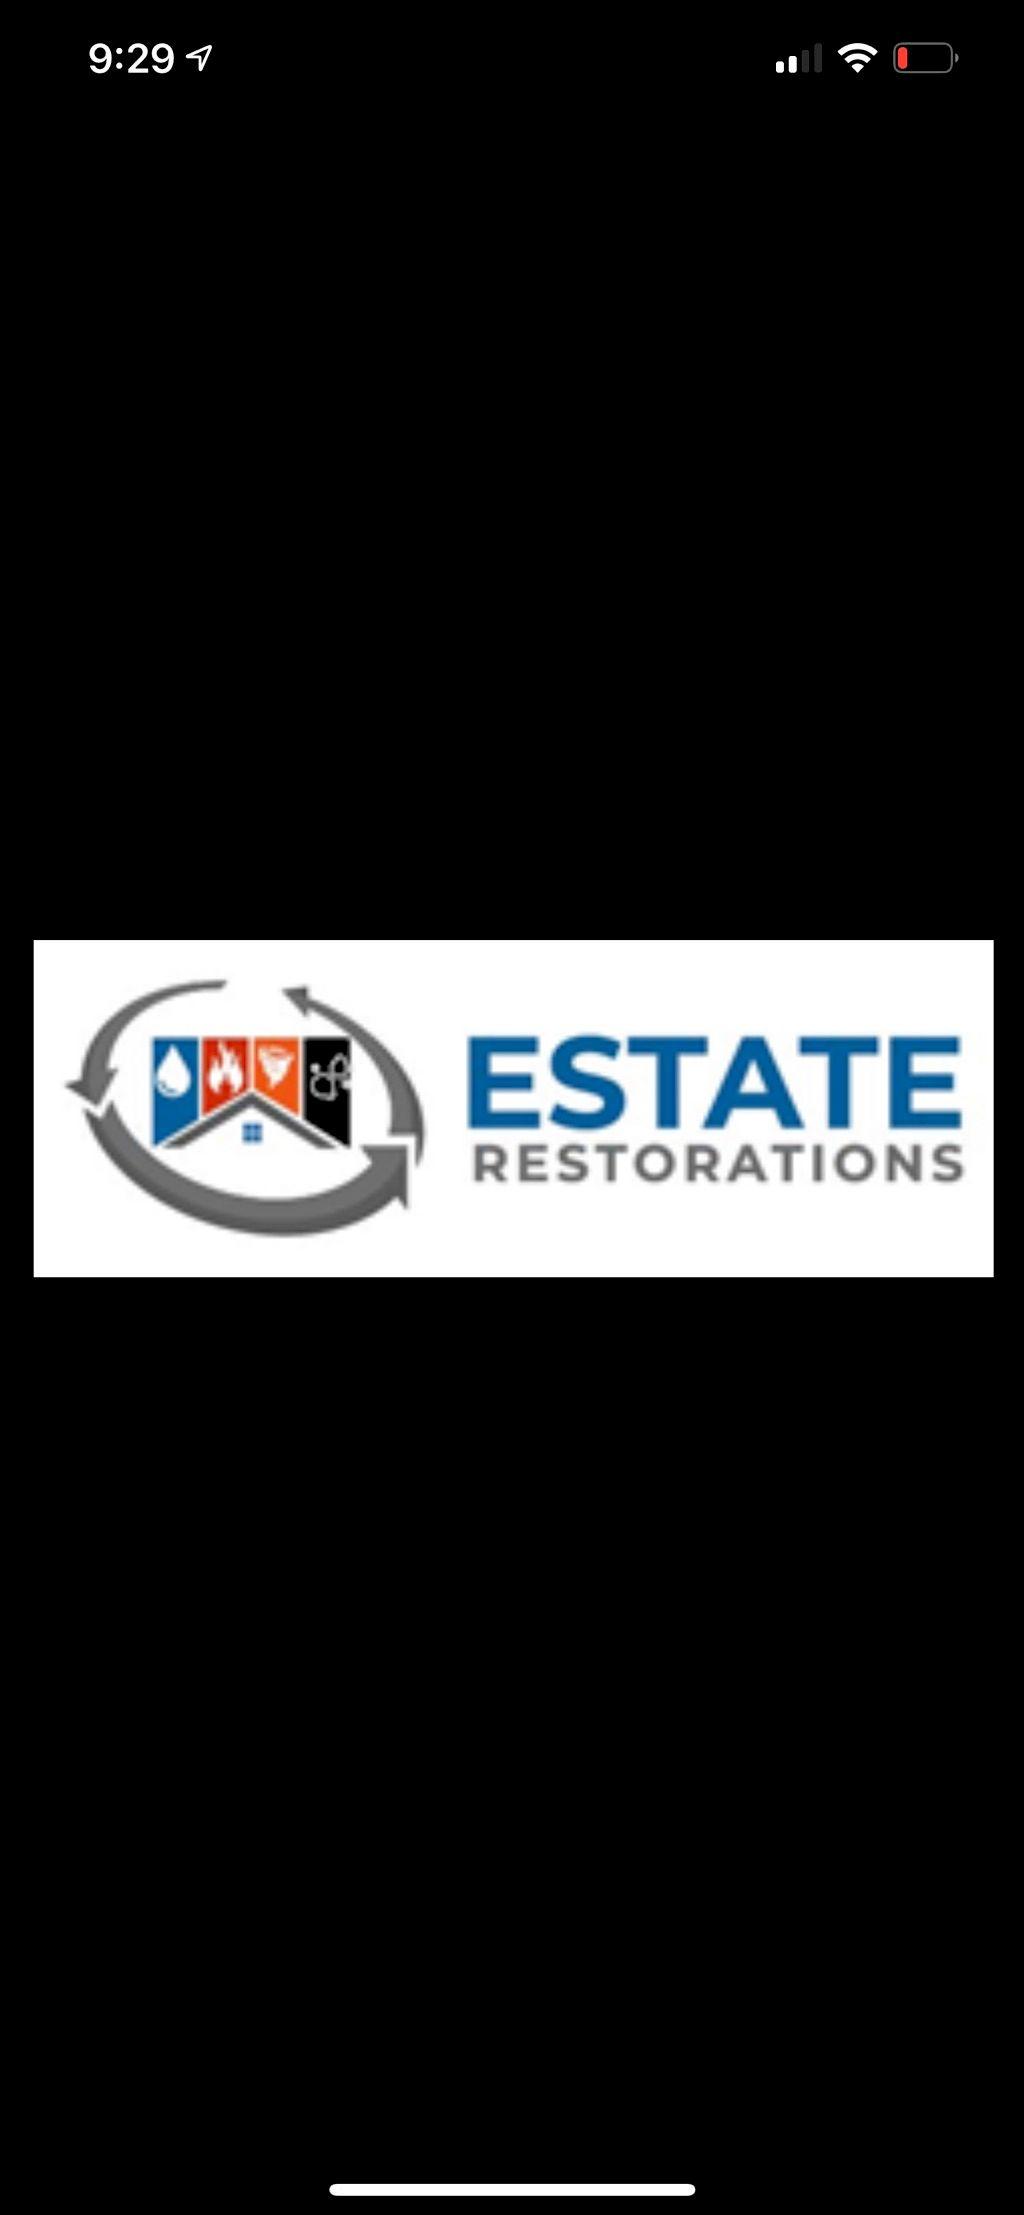 Estate Restorations